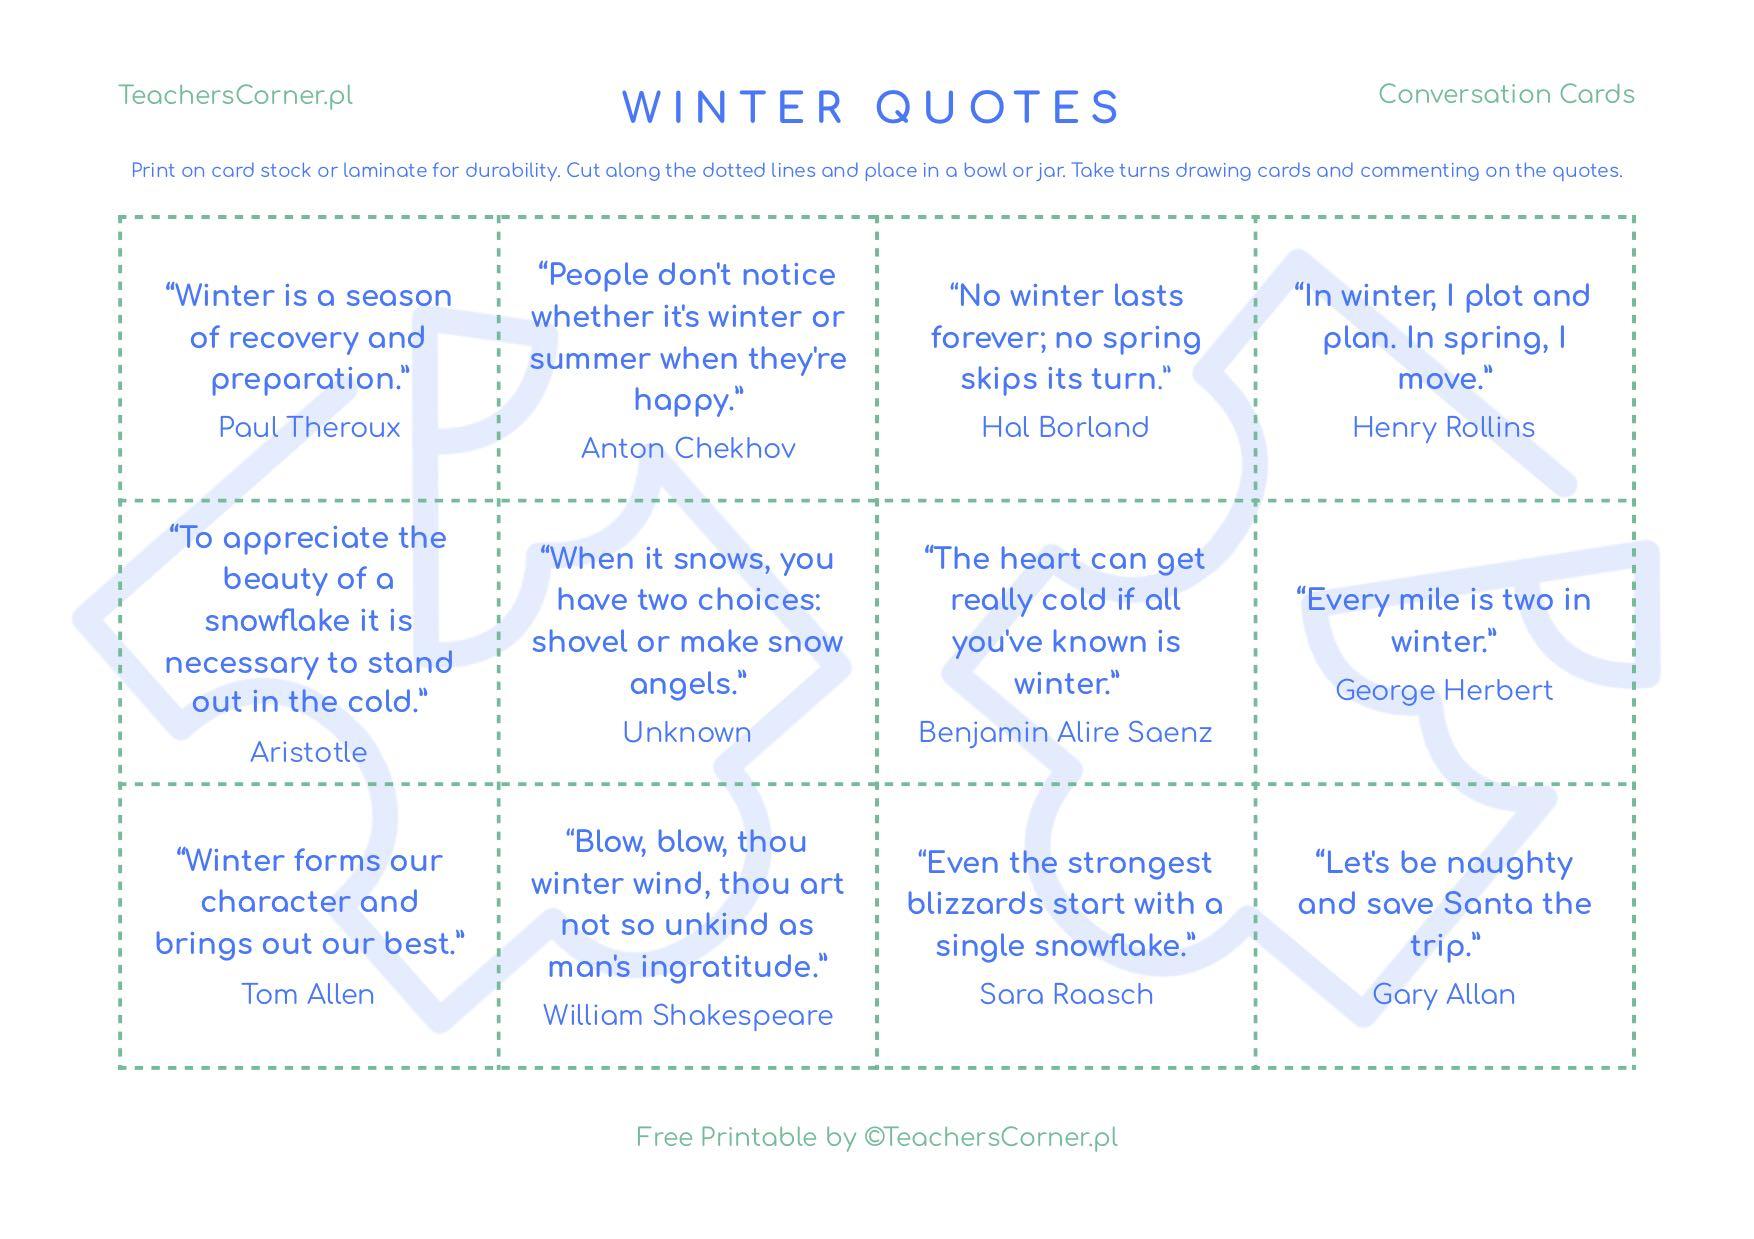 karty konwersacyjne Winter Quotes